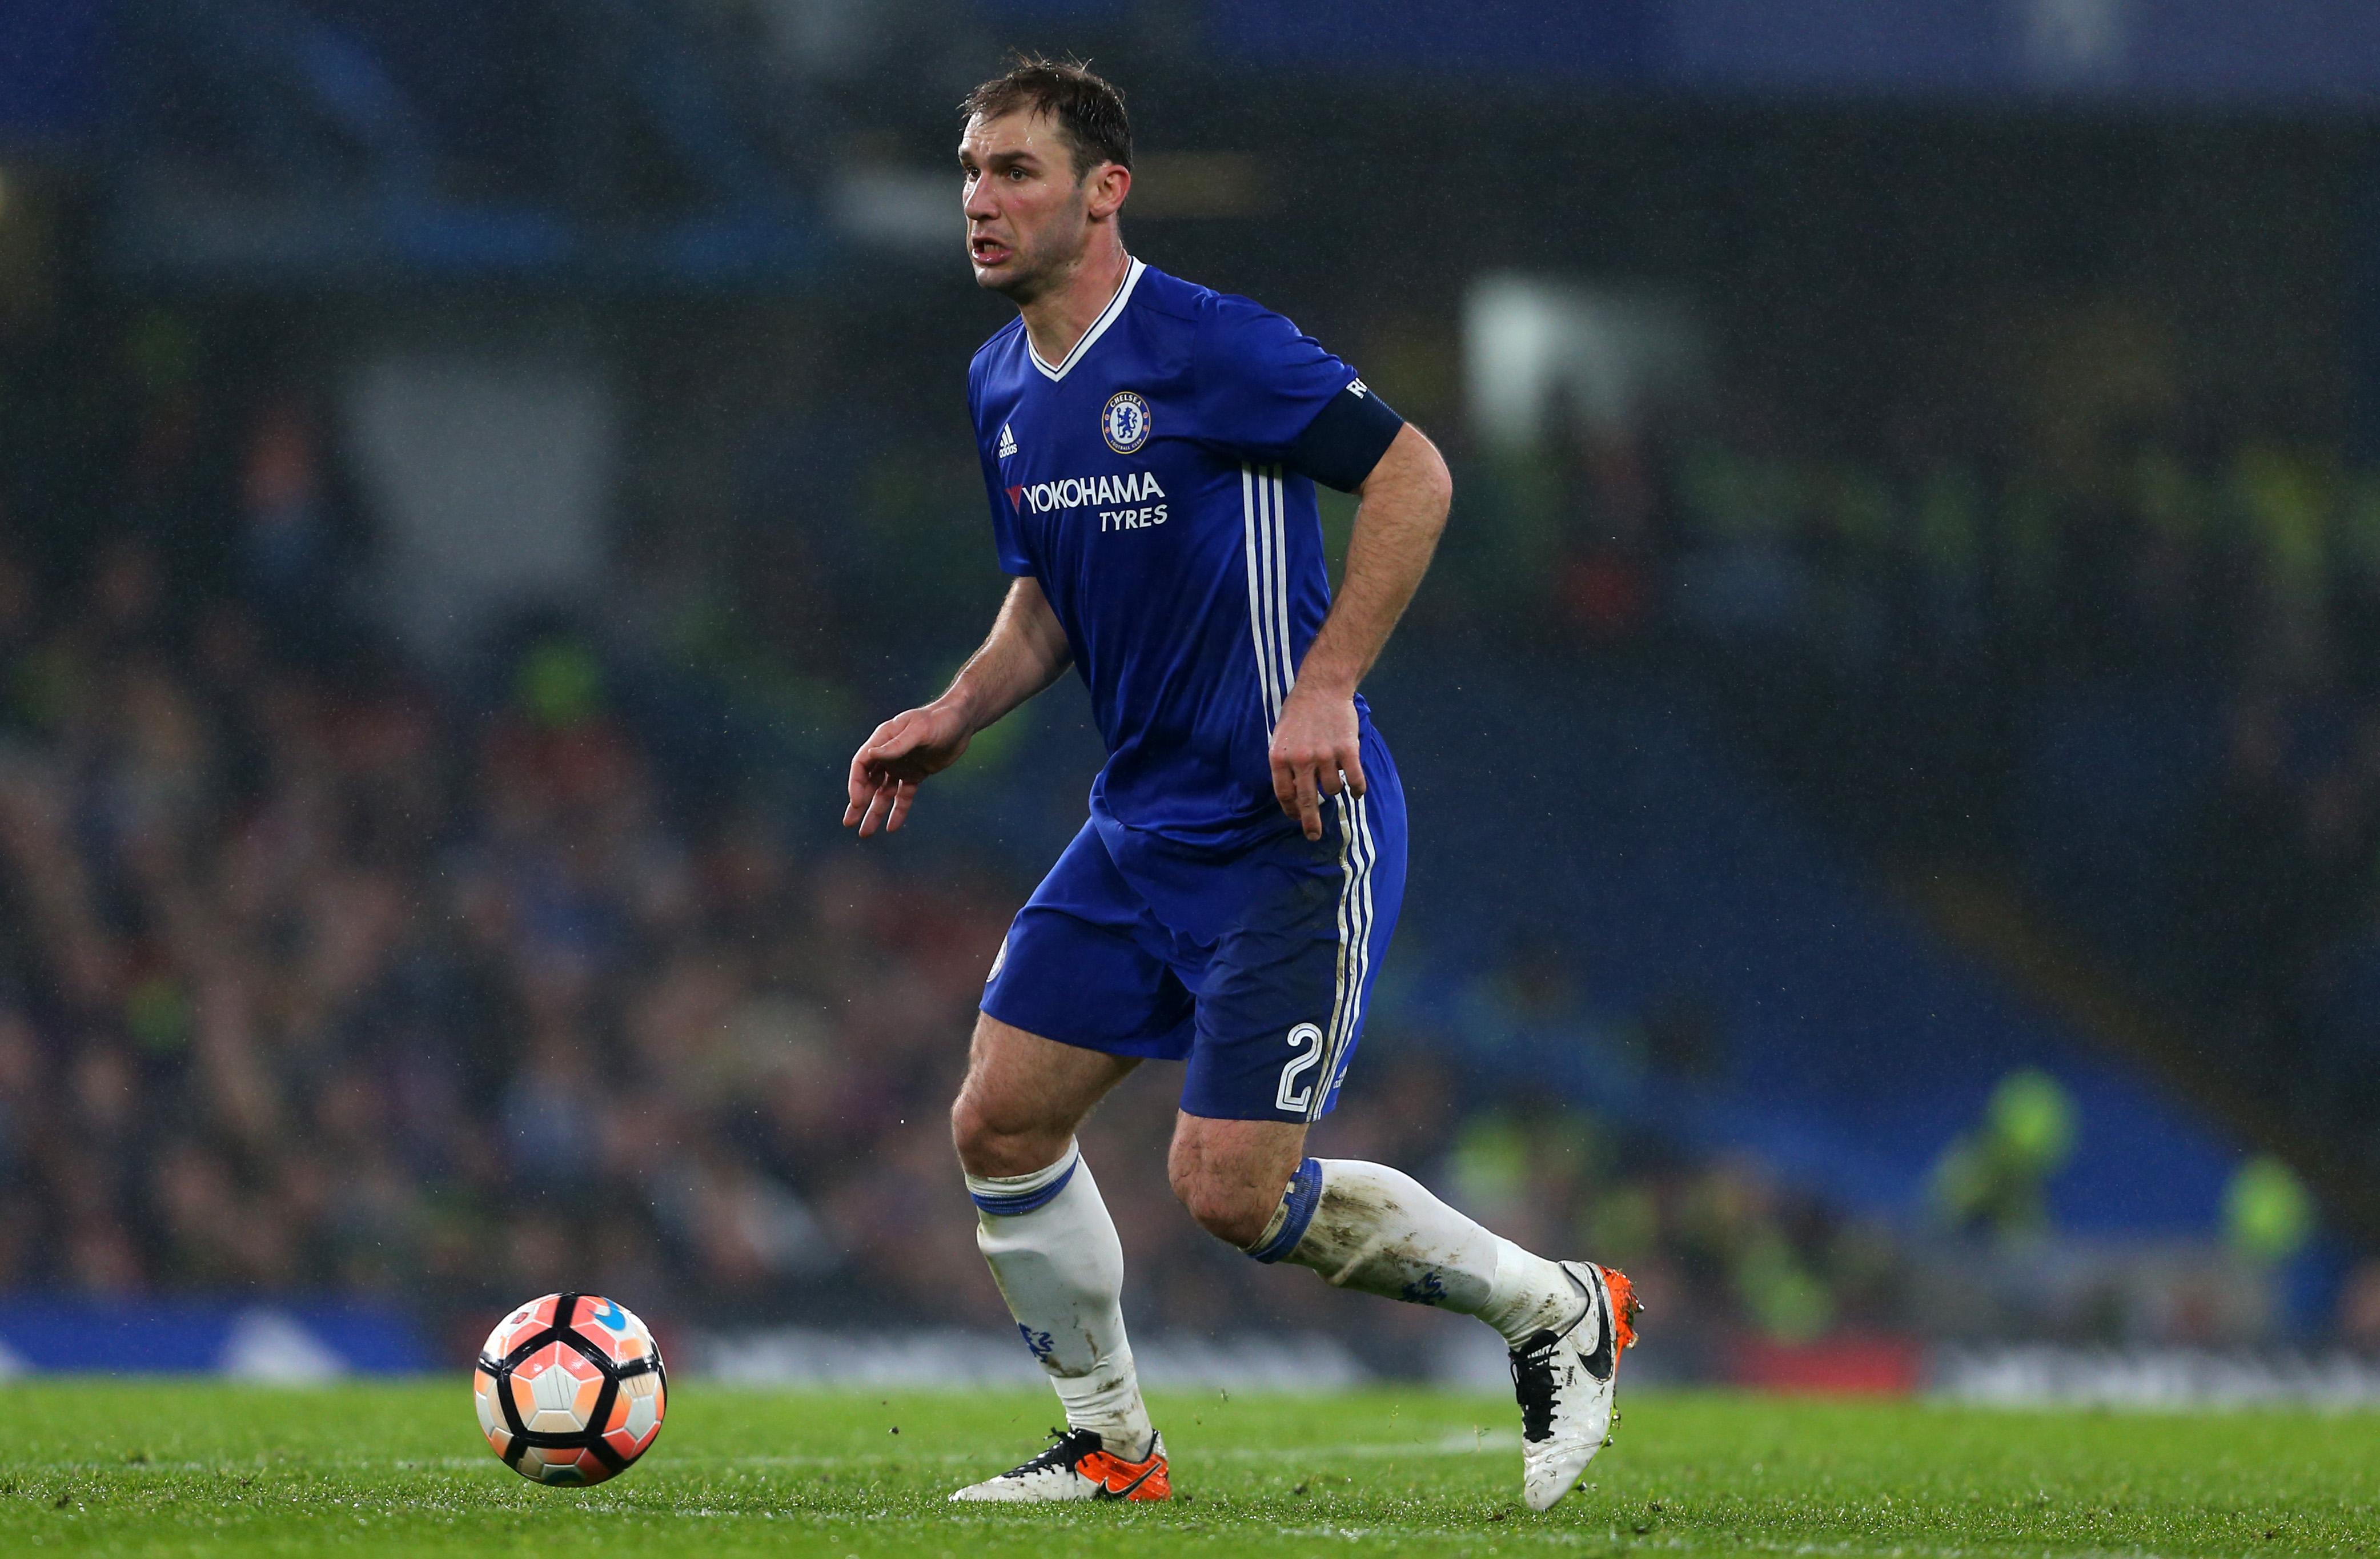 Chelsea legend Branislav Ivanovic on verge of signing for Zenit St Petersburg